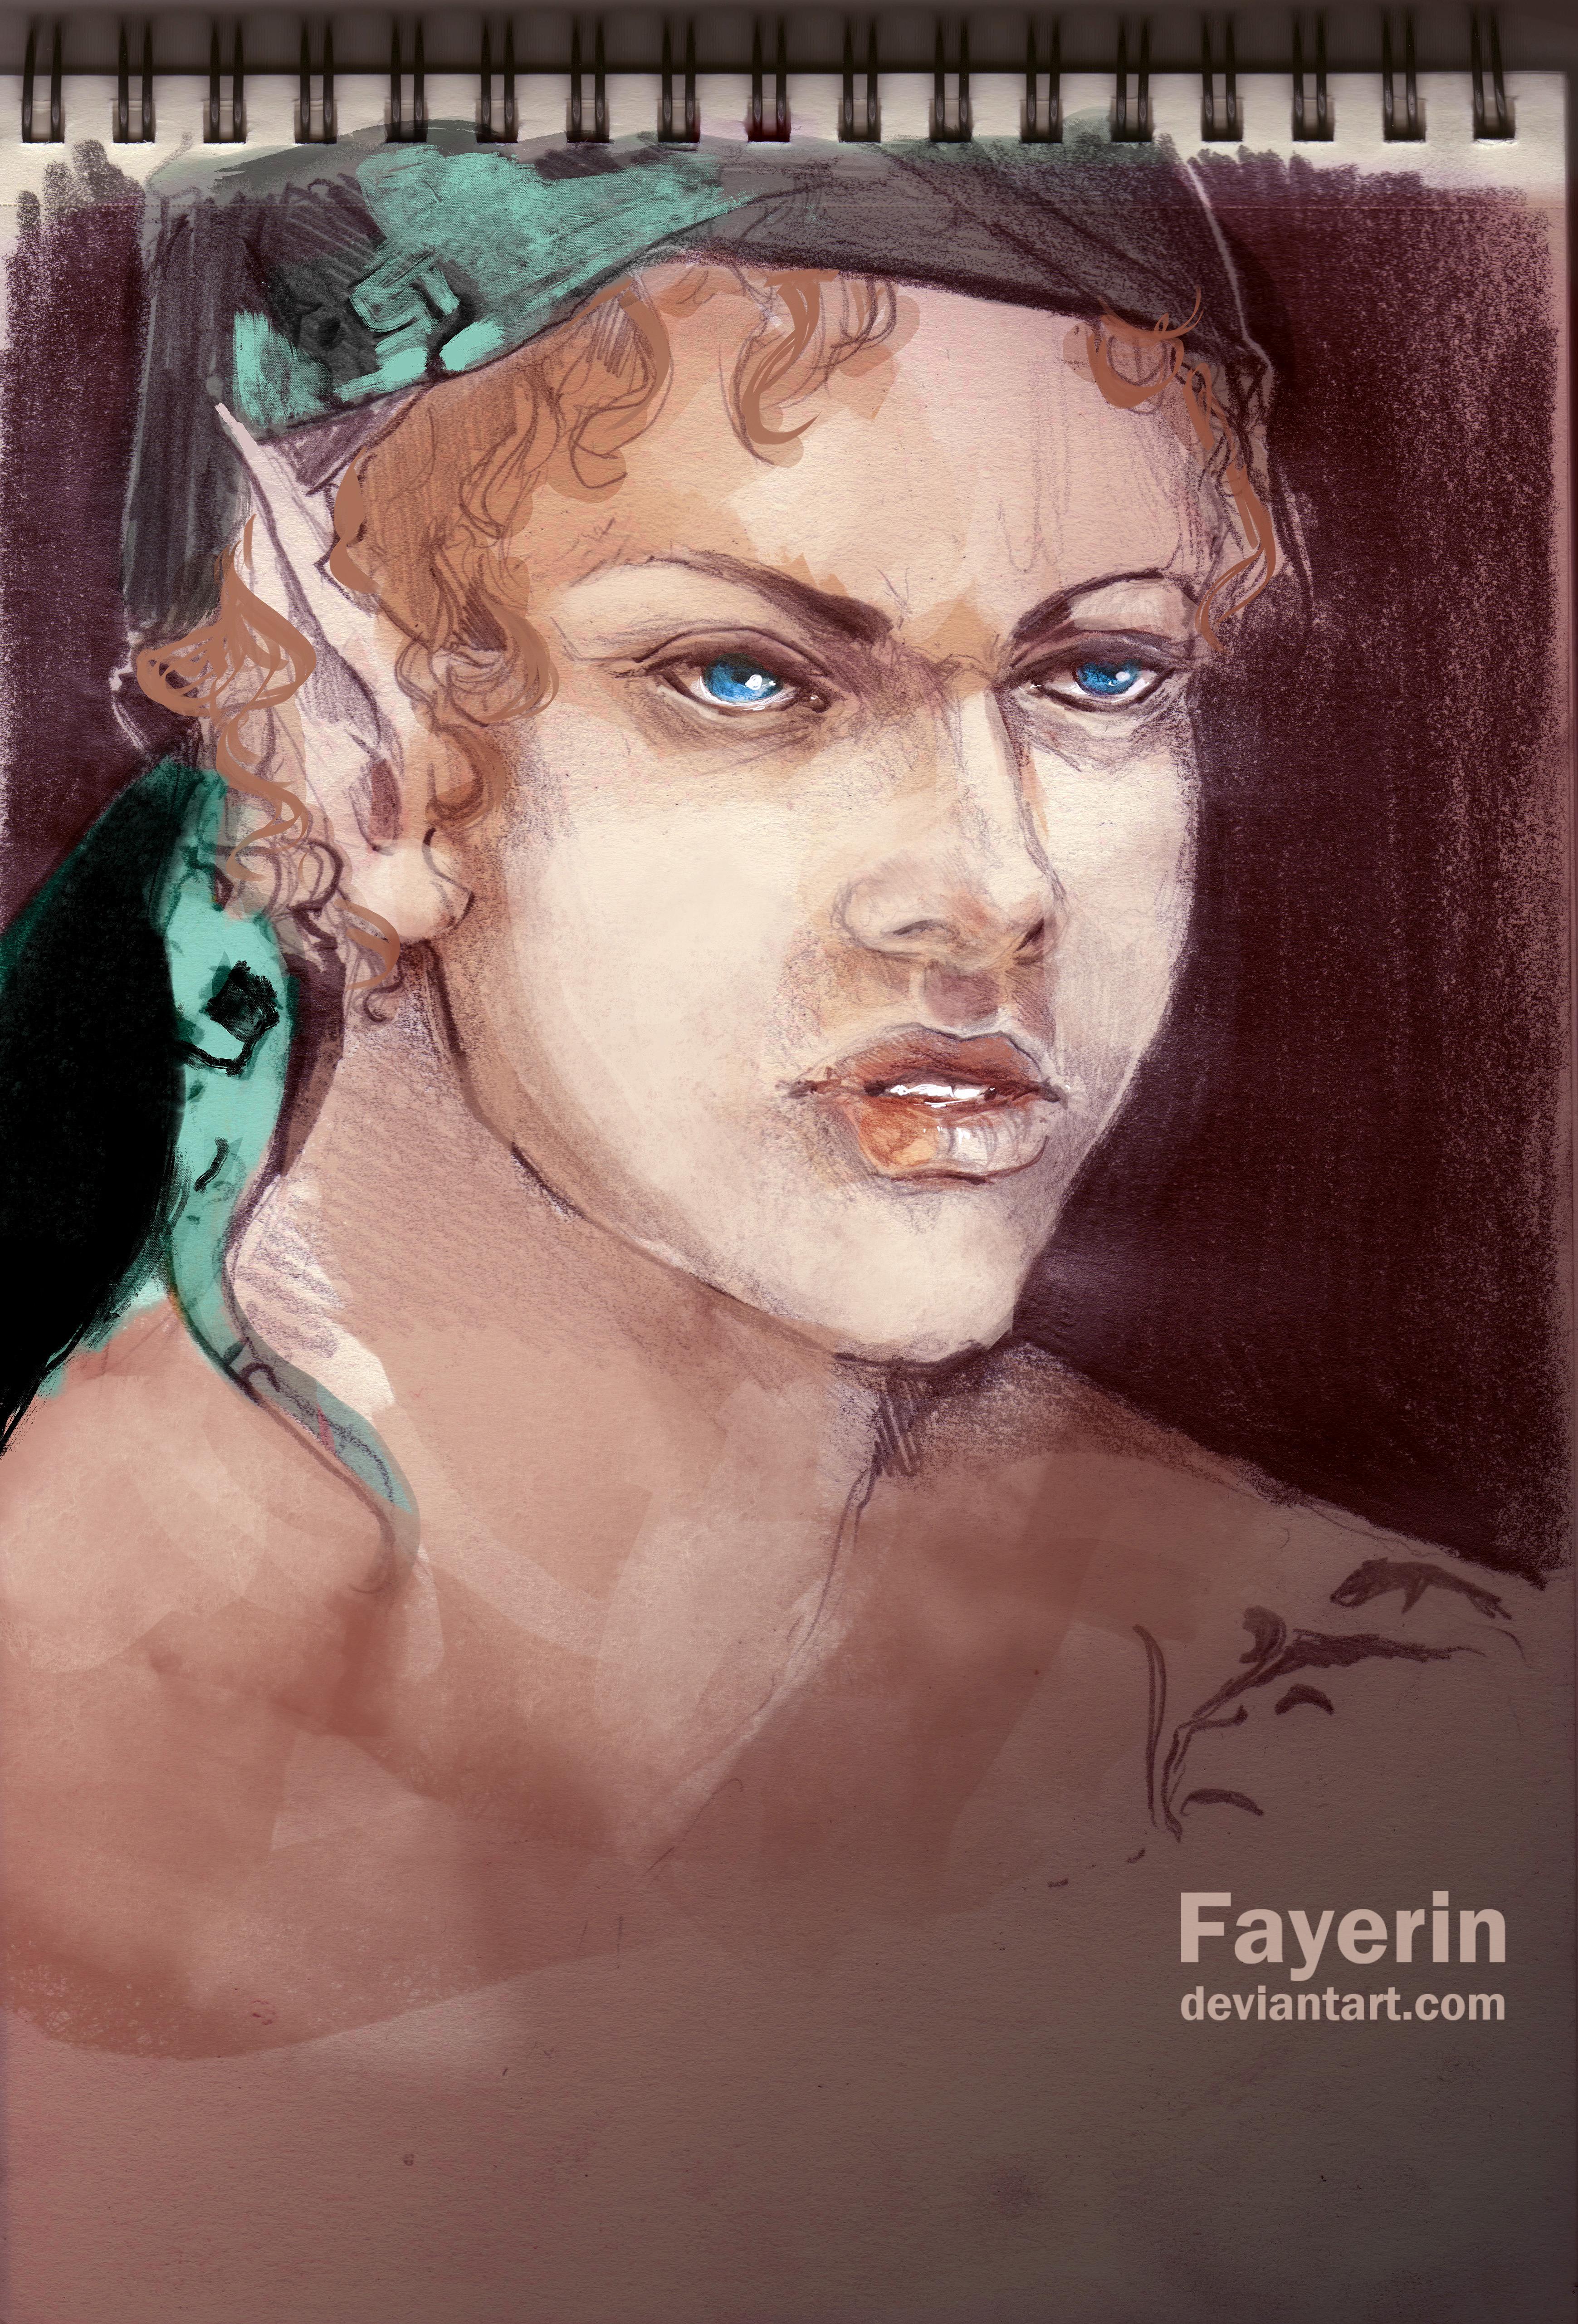 Laura Sketch by Fayerin